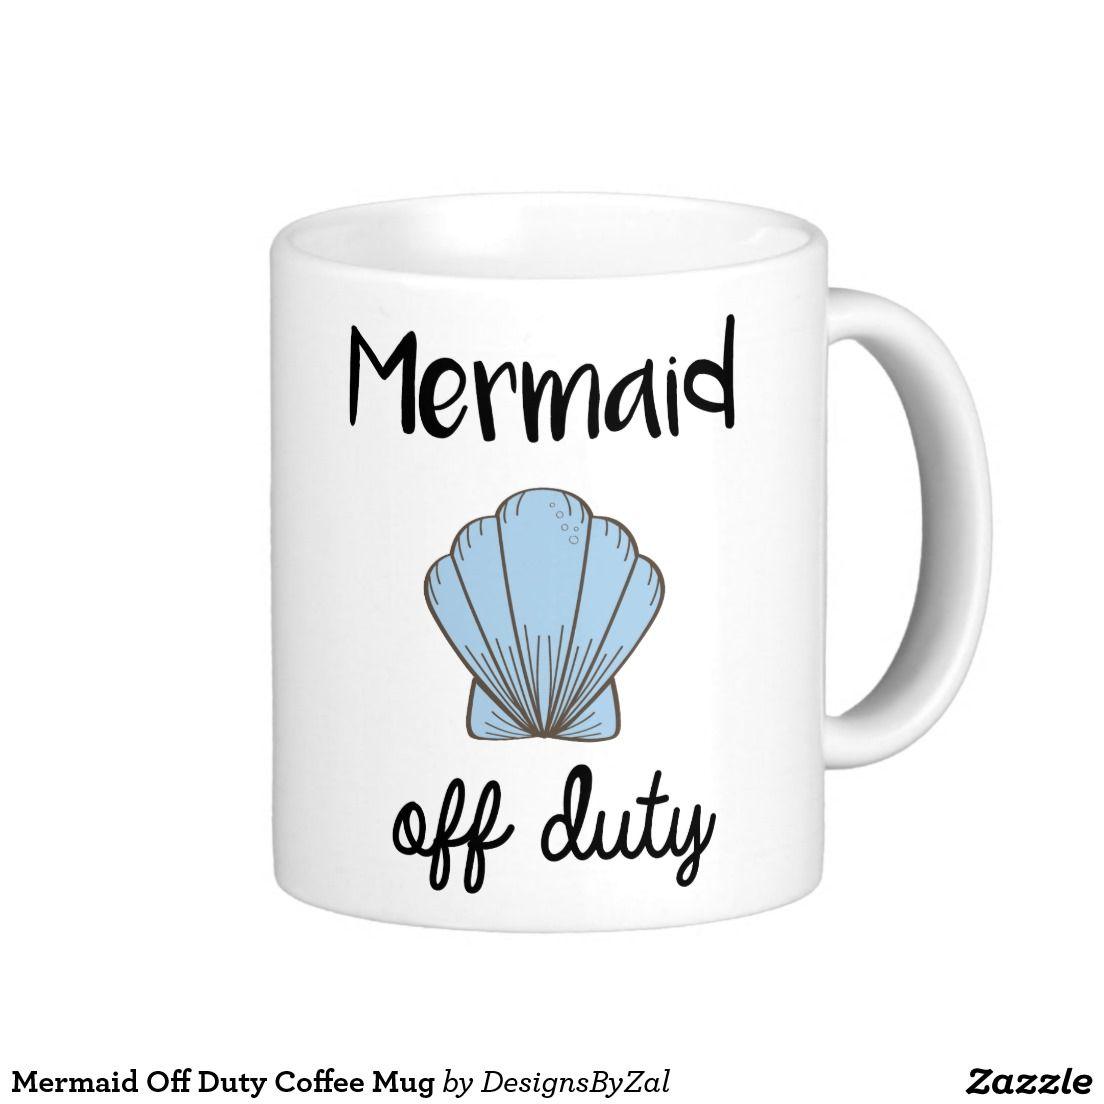 Mermaid Off Duty Coffee Mug Mugs Coffee Mugs Mermaid Off Duty